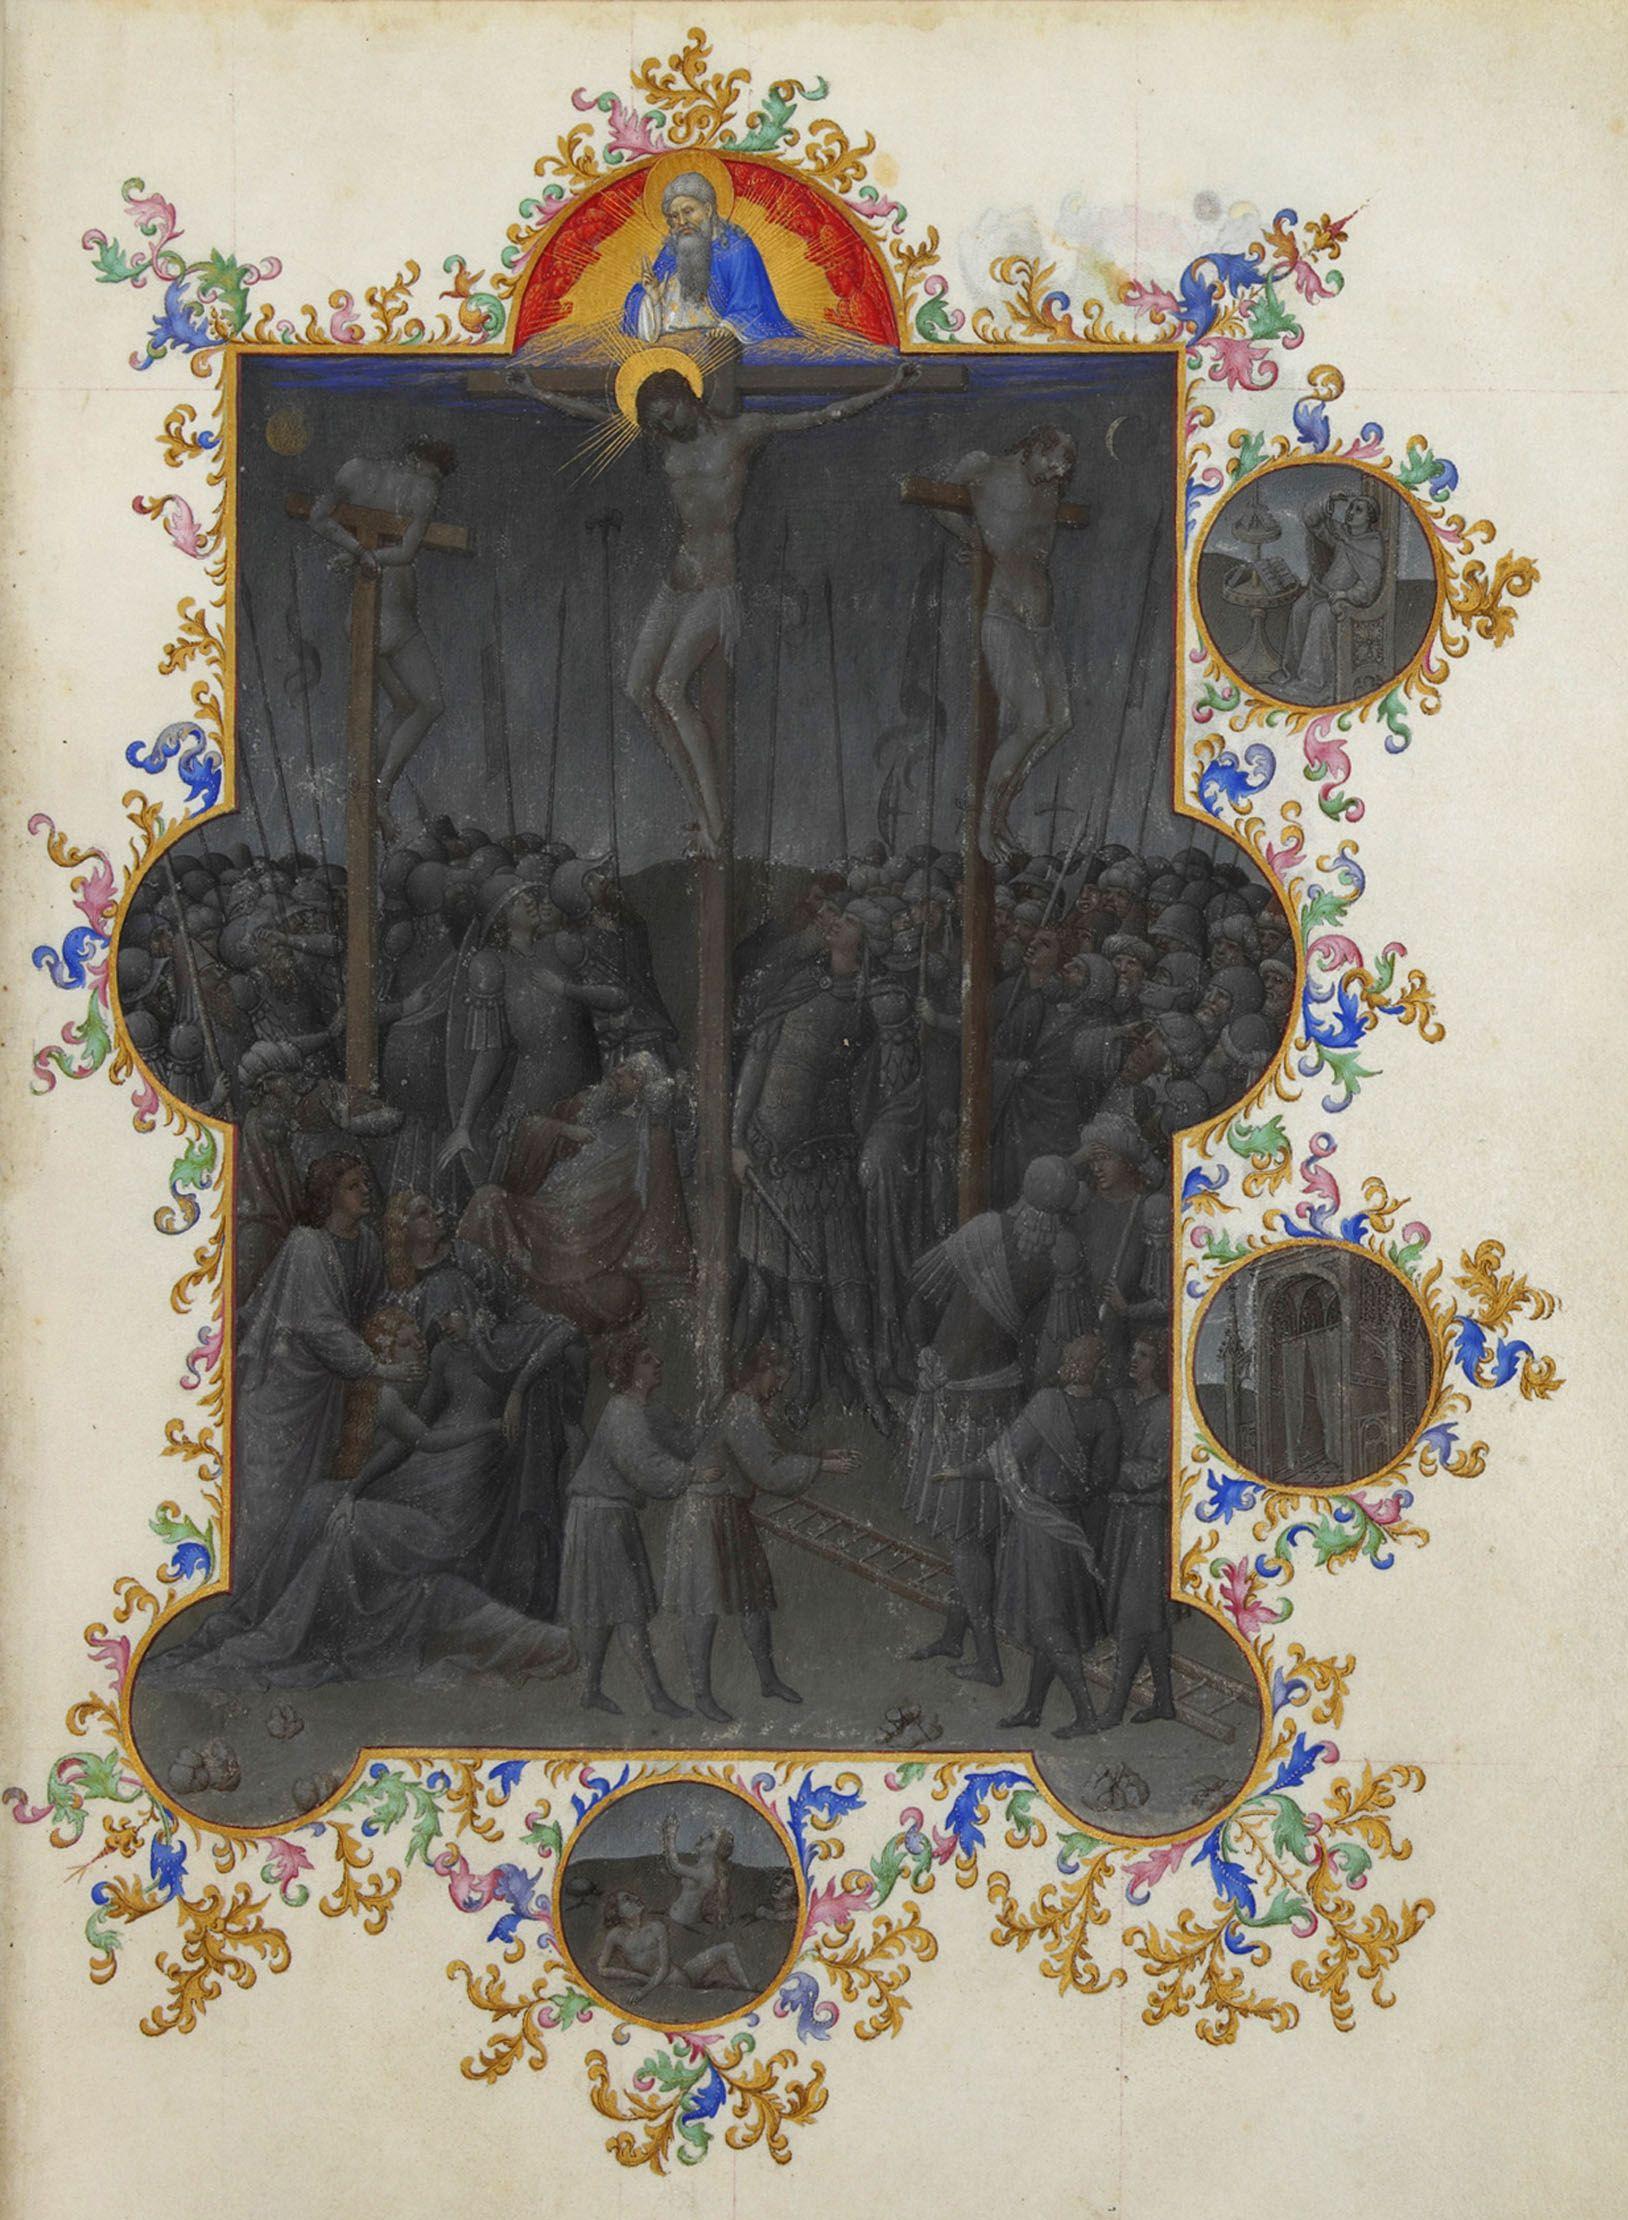 Folio_153r_-_The_Death_of_Christ.jpg